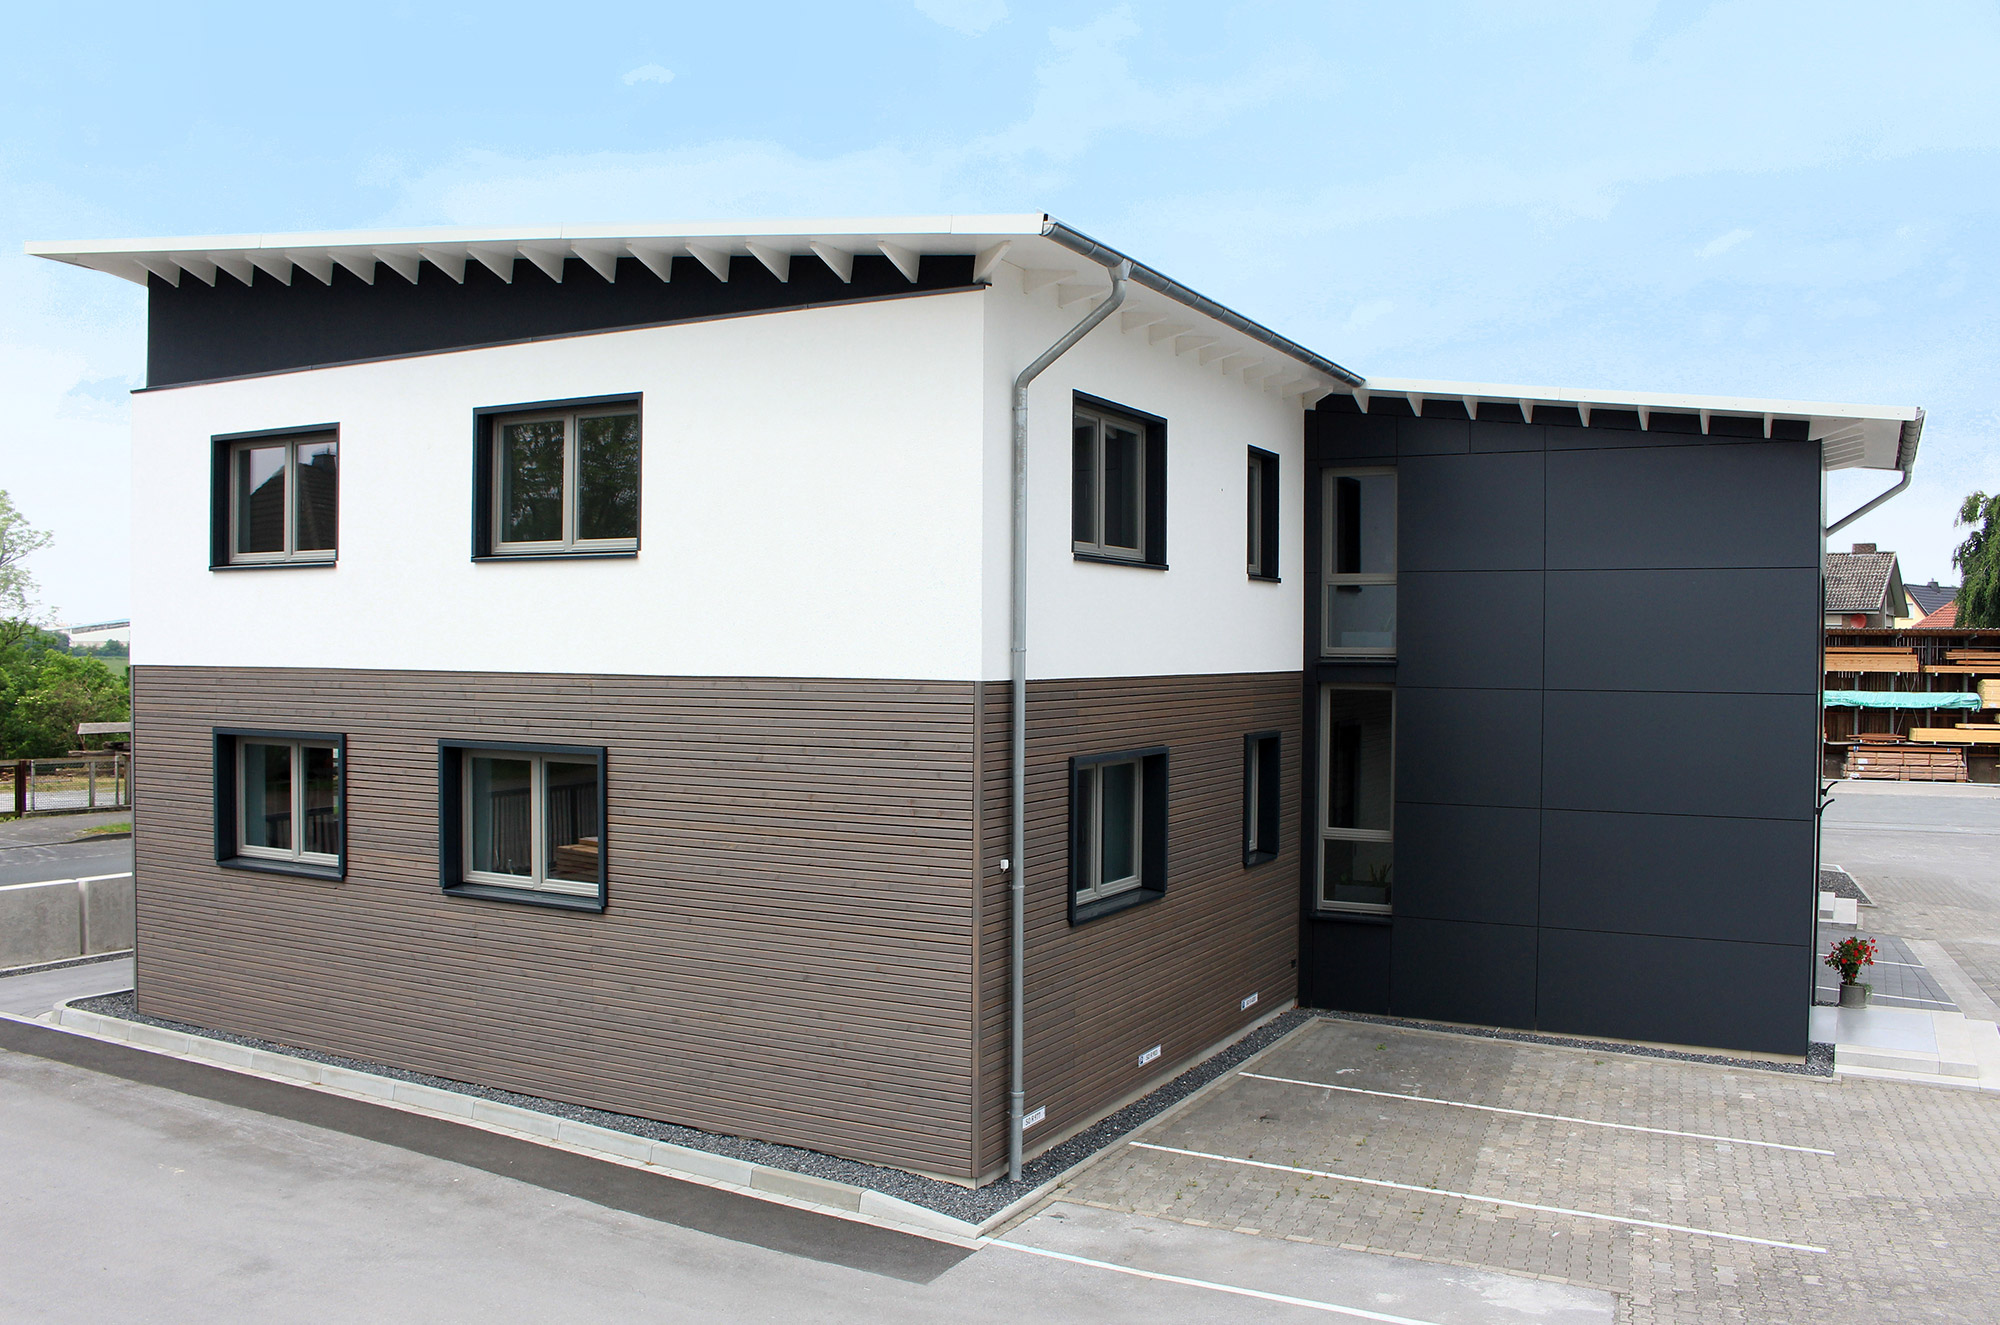 Gewerbe- Bürobau Kreis Soest & Lippstadt & Paderborn